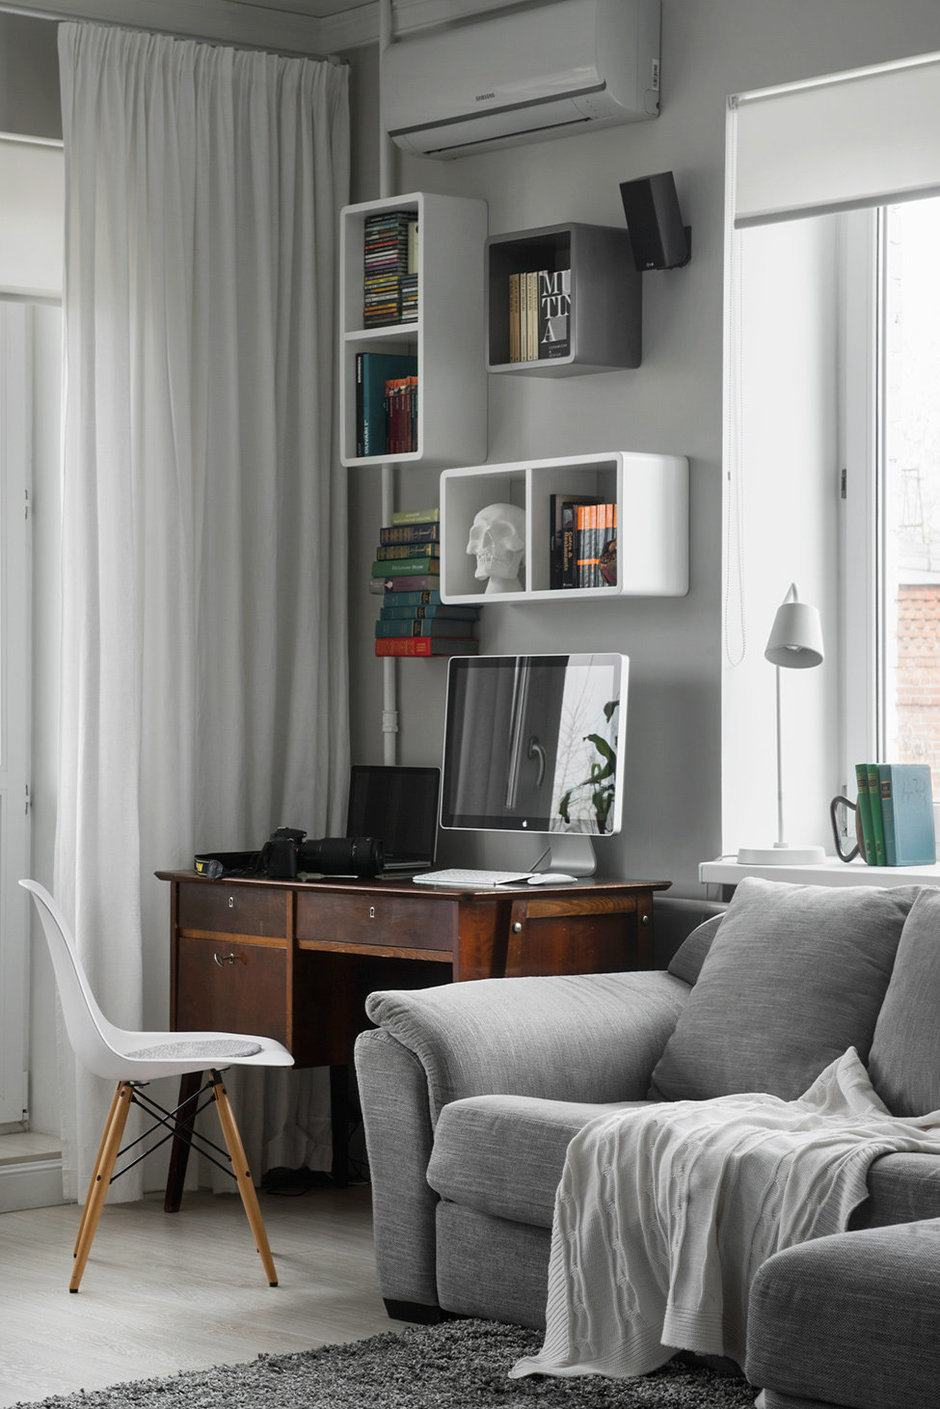 Фотография: Гостиная в стиле Современный, Малогабаритная квартира, Квартира, Дома и квартиры, IKEA, Проект недели, Хрущевка – фото на InMyRoom.ru